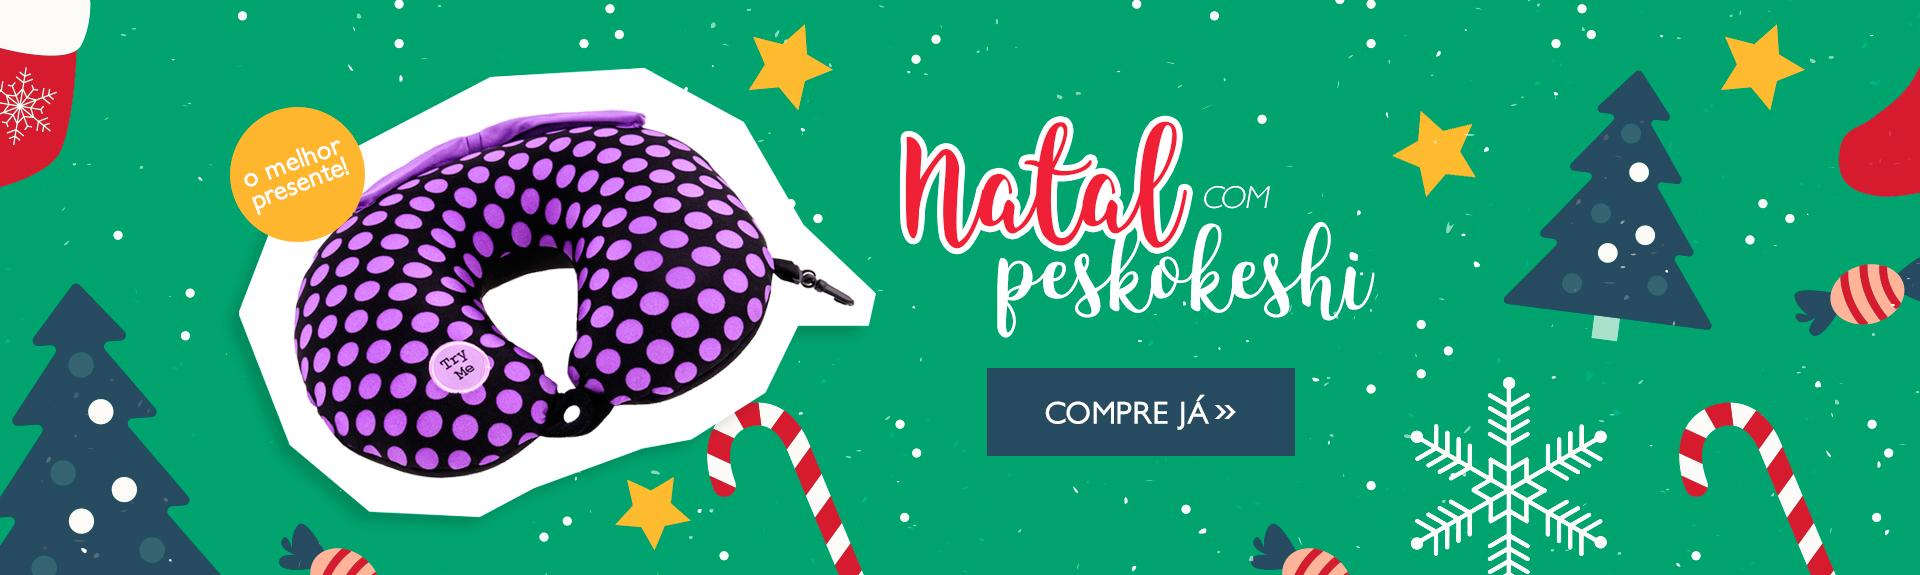 Natal com PESKOKESHI >>